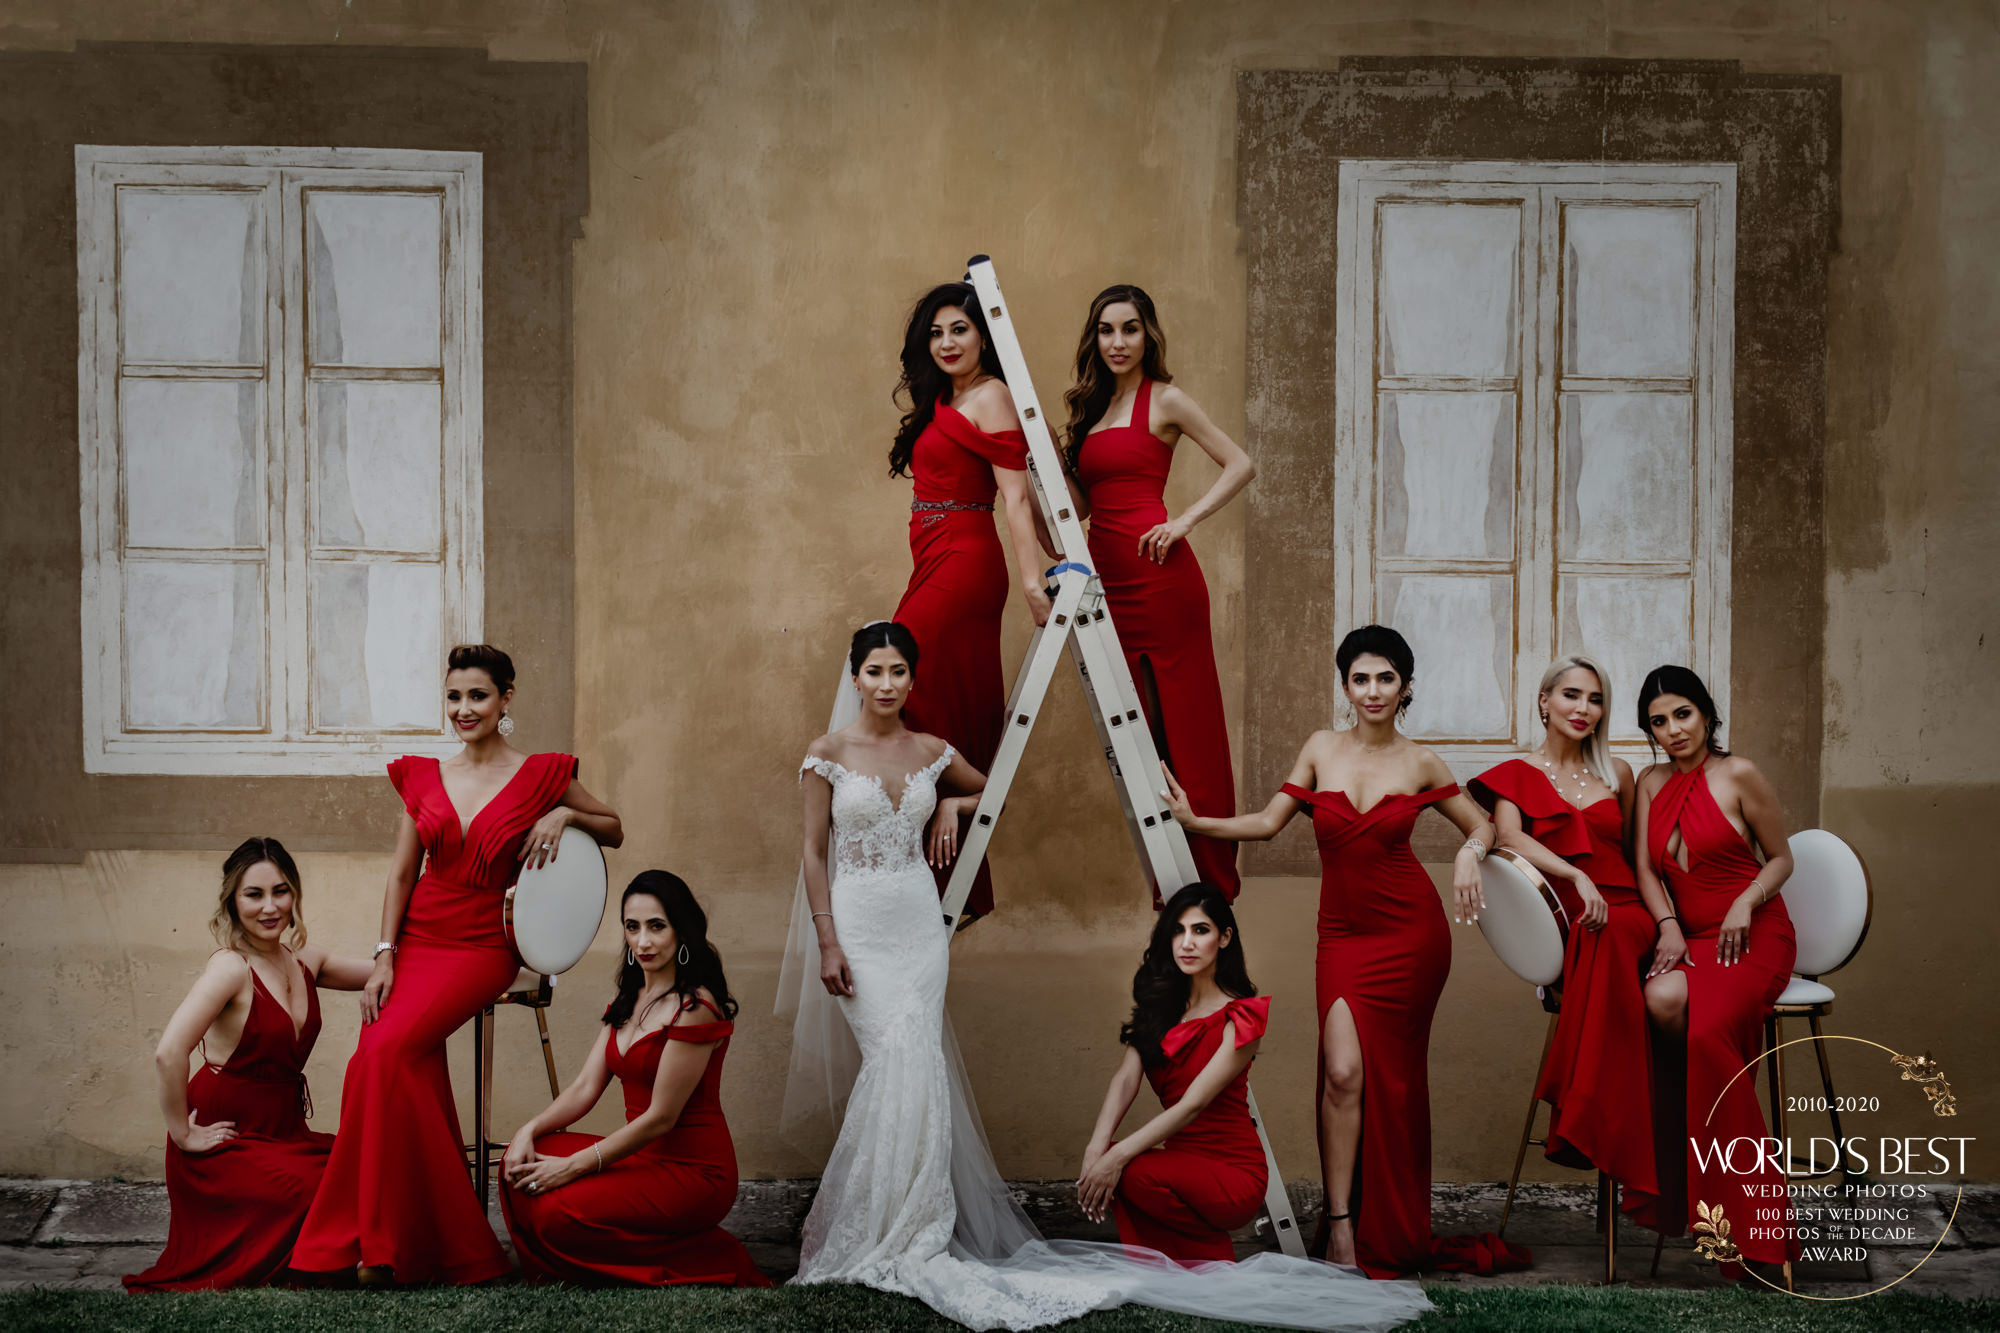 Award-winning fashion focused bridal part portrait by David Bastianoni - Italy